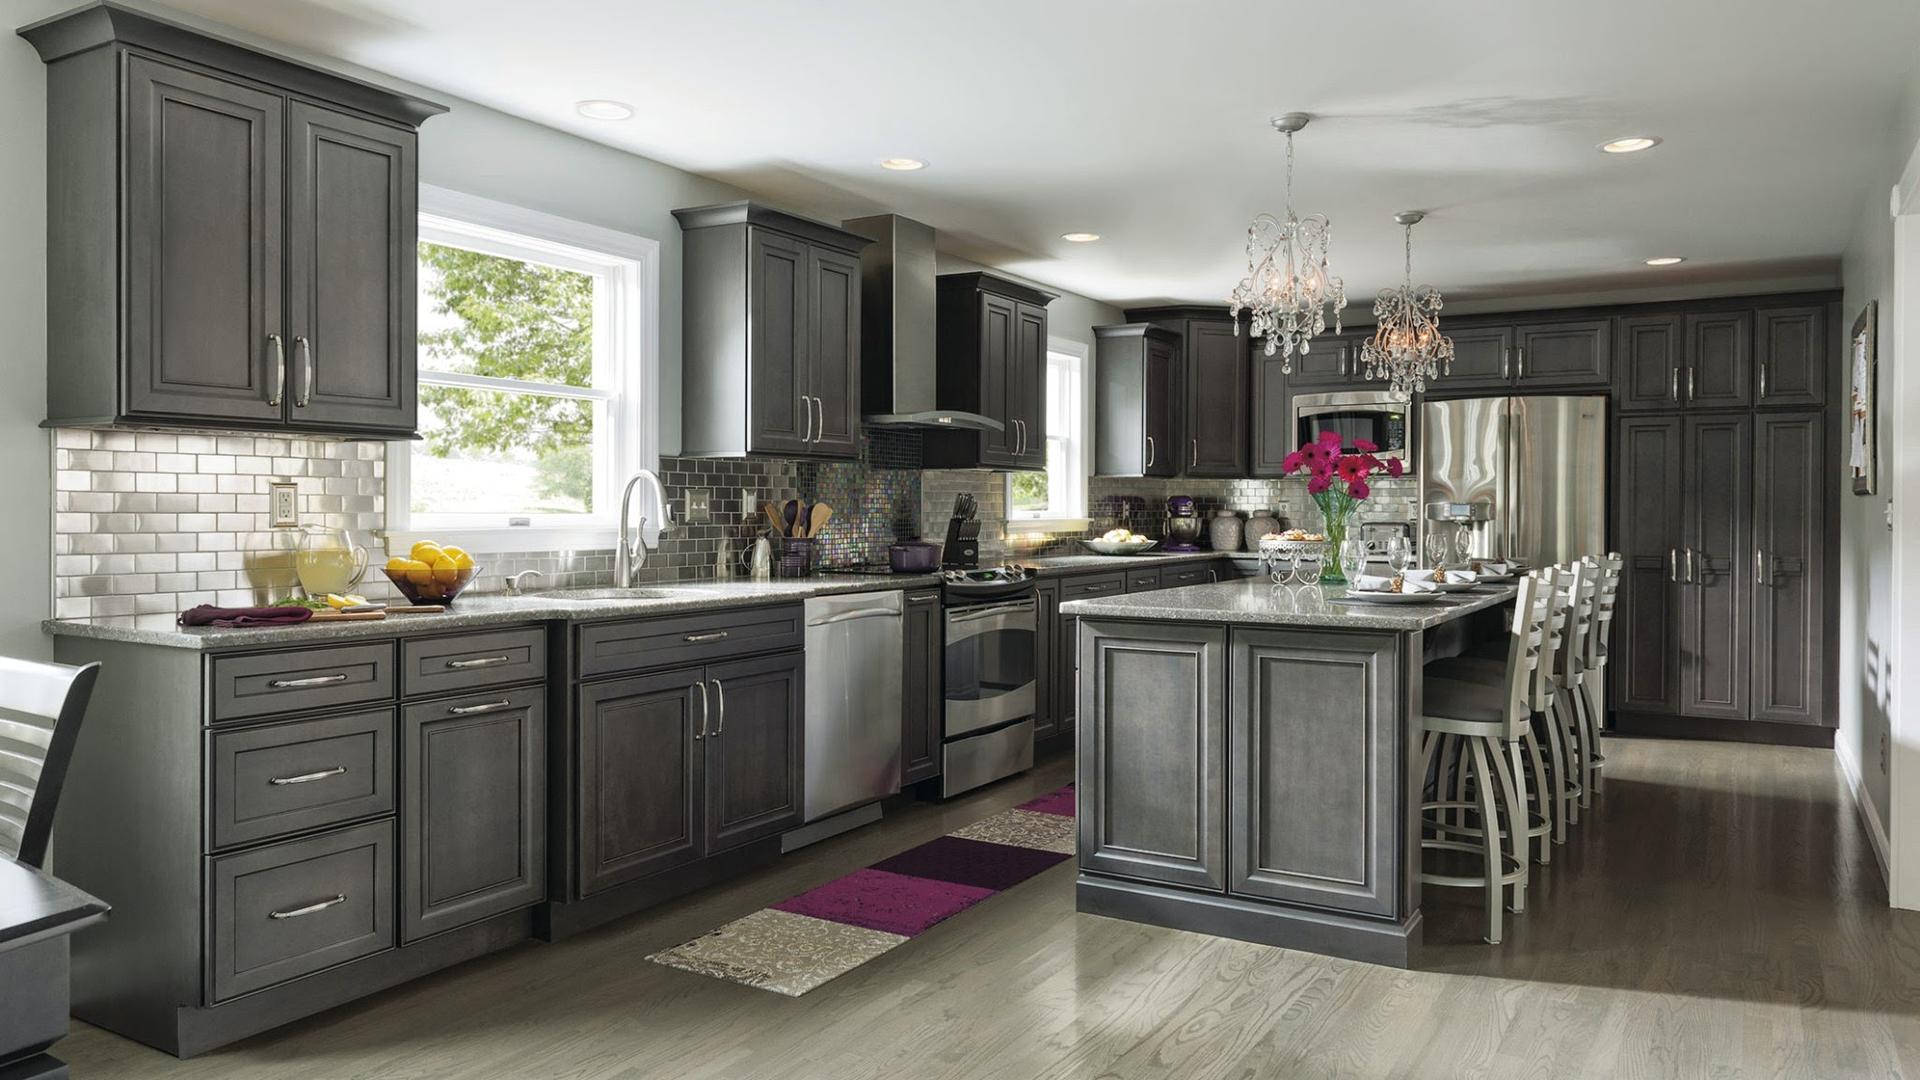 Marble Or Granite For Kitchen Stanleys Marble And Granite Granite Kitchen Countertops Quartz